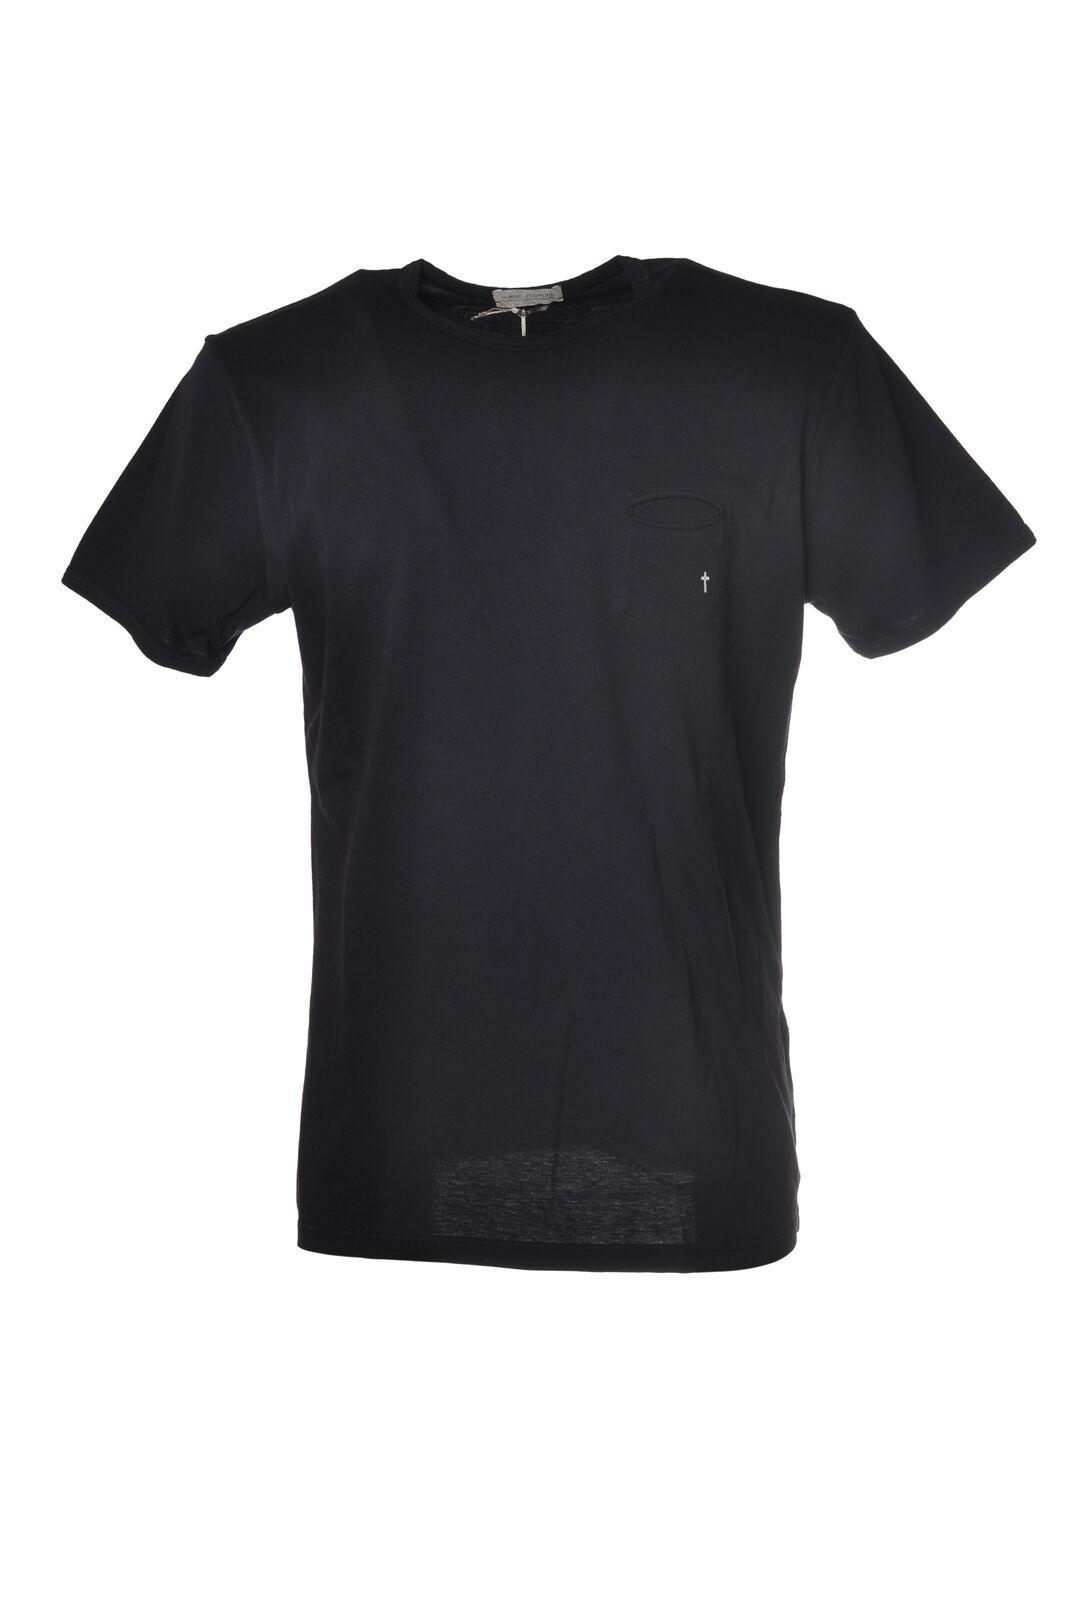 Daniele Alessandrini - Topwear-T-shirts - Mann - blue - 5626107C195011